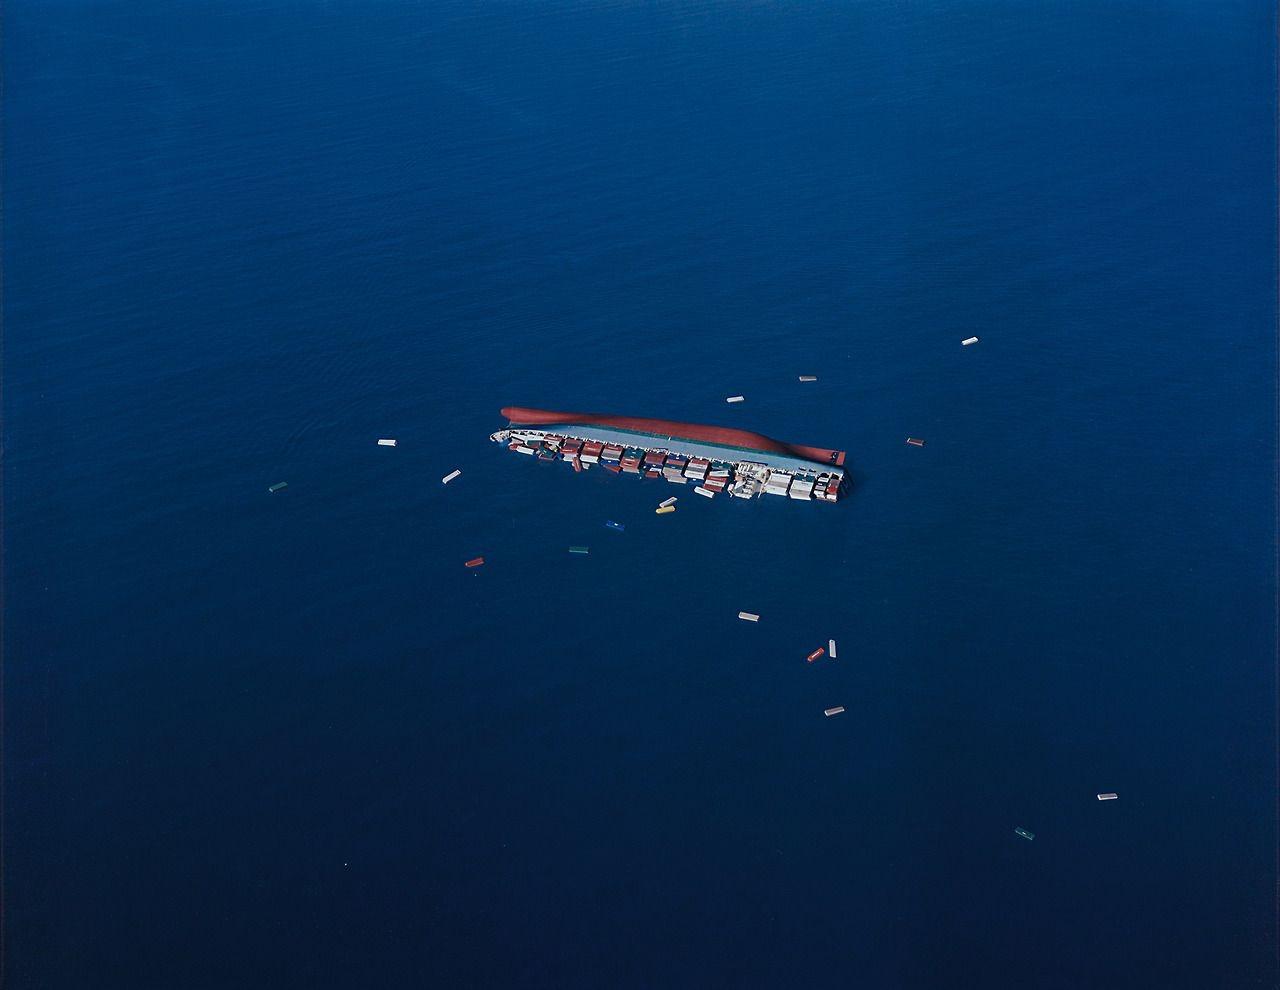 Опрокинутое судно, 2002. Фотограф Флориан Майер-Айхен